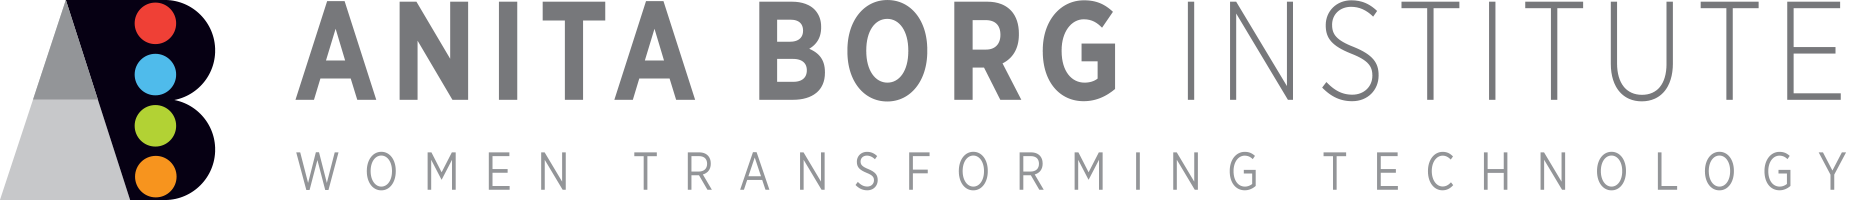 PRIMARY - ABI logo - horizontal